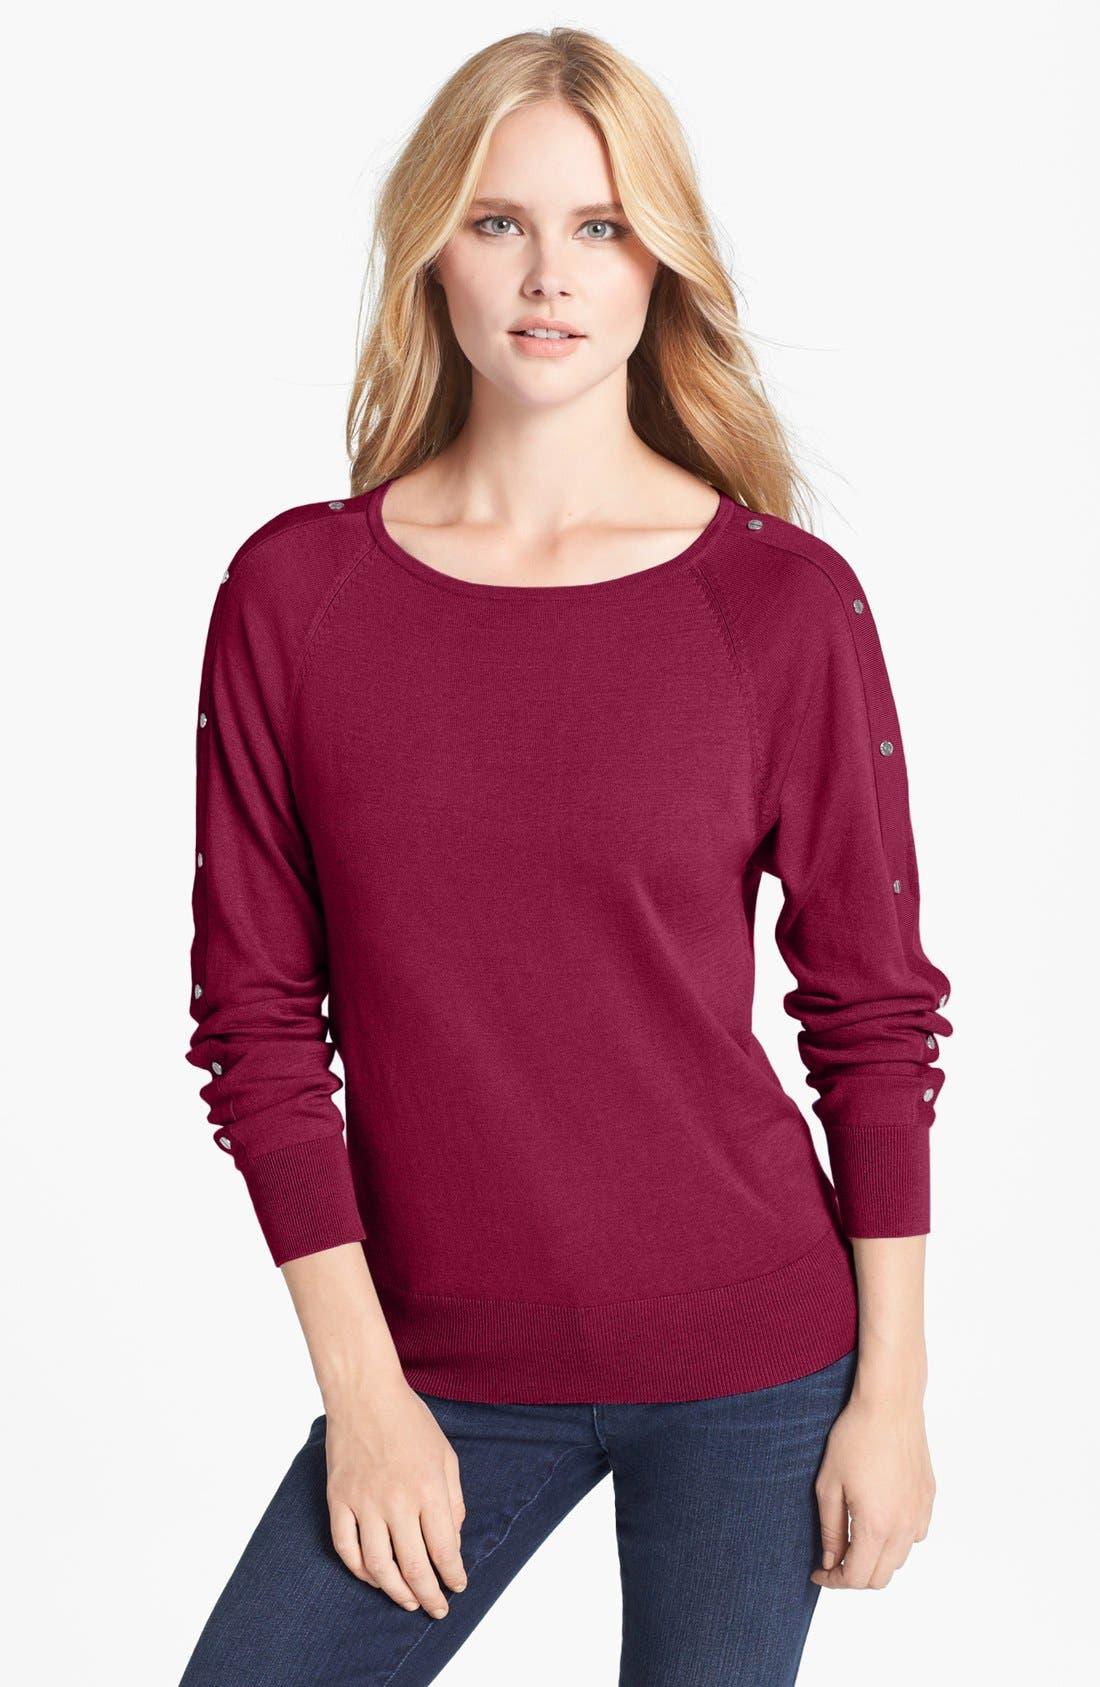 Alternate Image 1 Selected - MICHAEL Michael Kors Studded Sleeve Sweater (Petite)